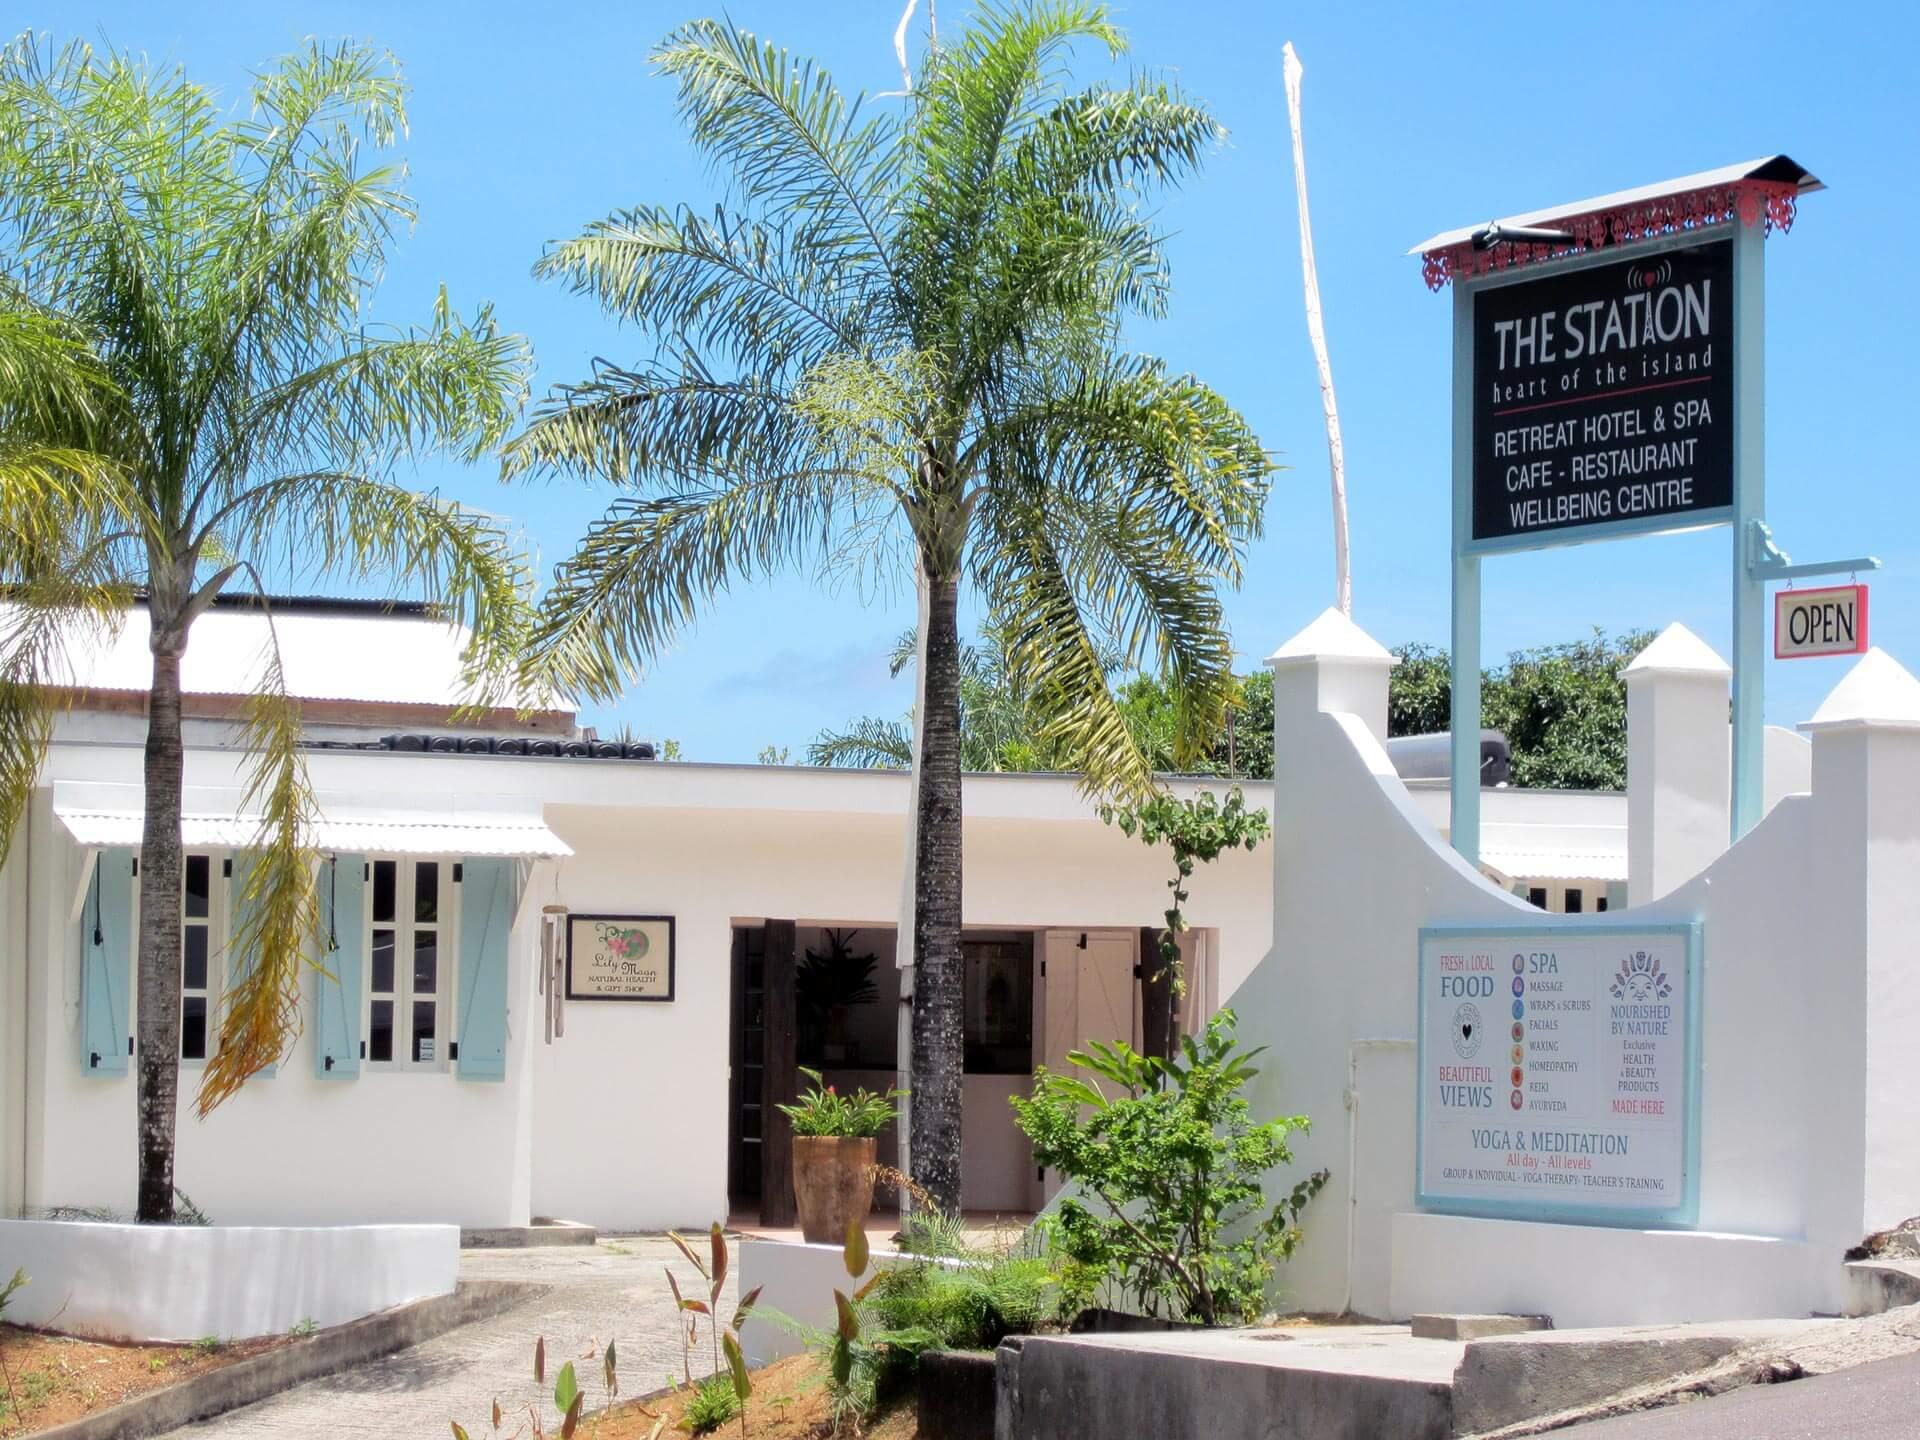 Lieblingsplätze Archive - Seychellen-Inselglueck.de